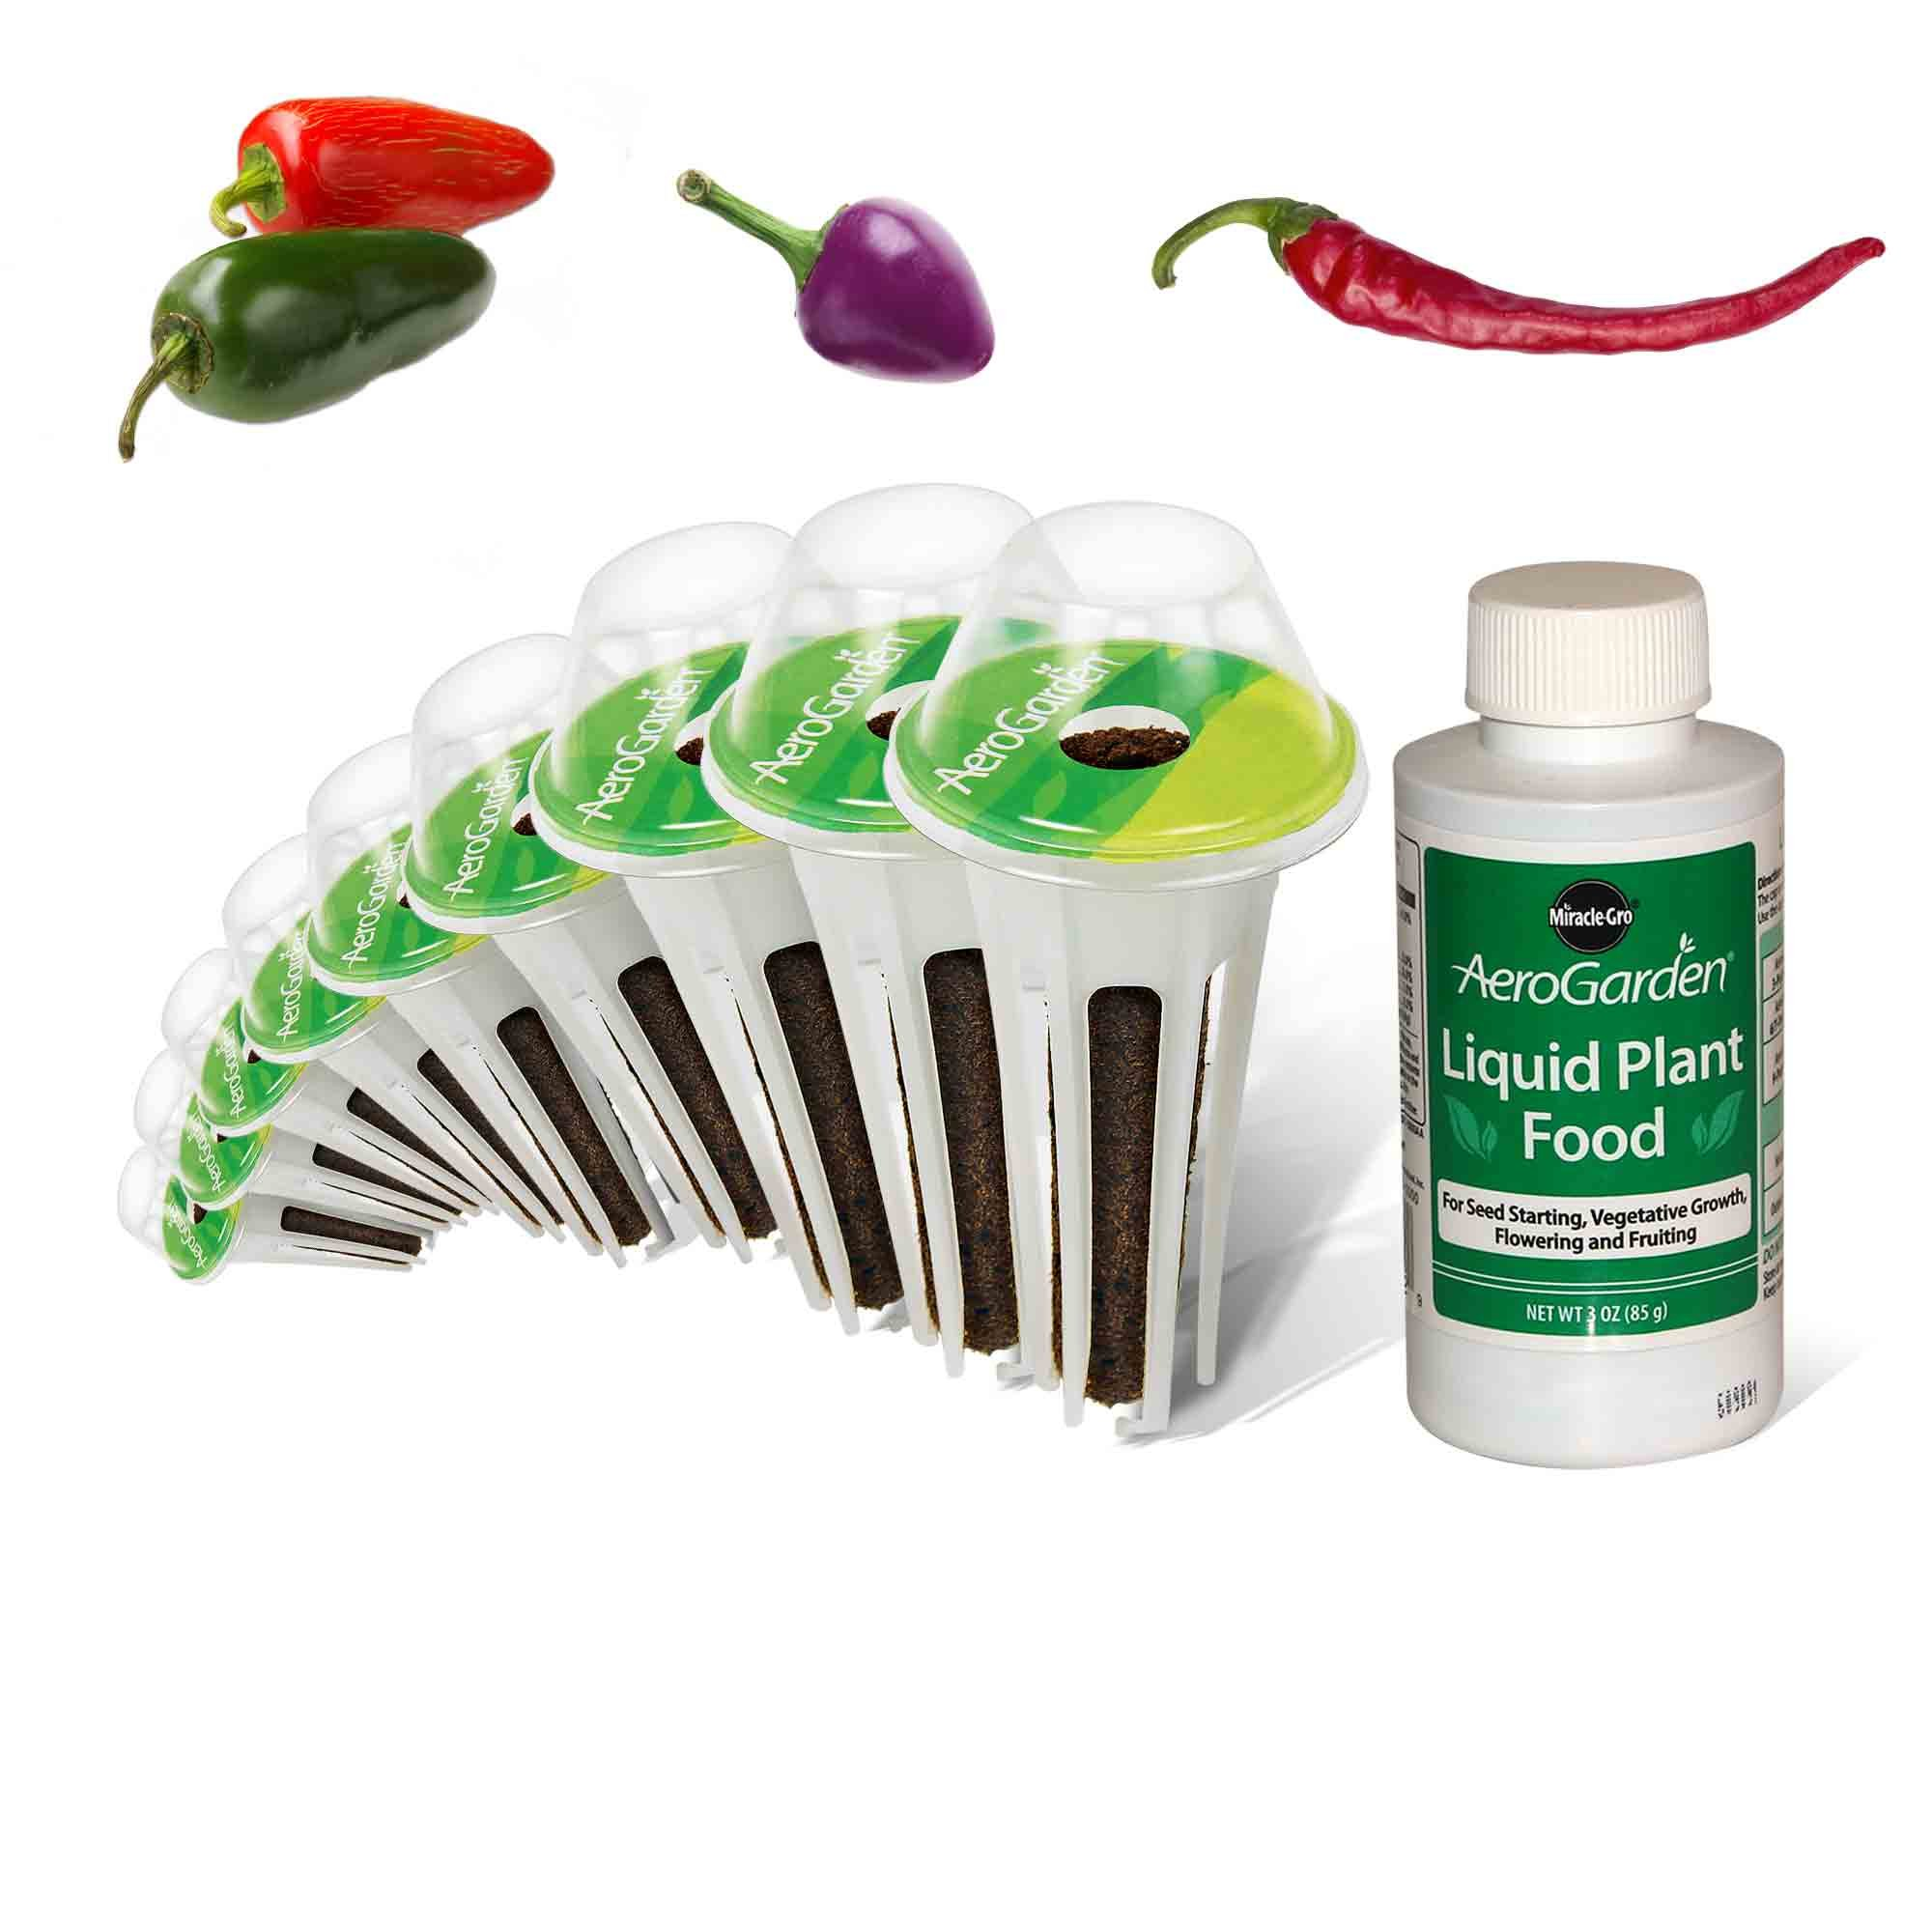 AeroGarden Spicy Chili Pepper Variety Seed Pod Kit by AeroGarden